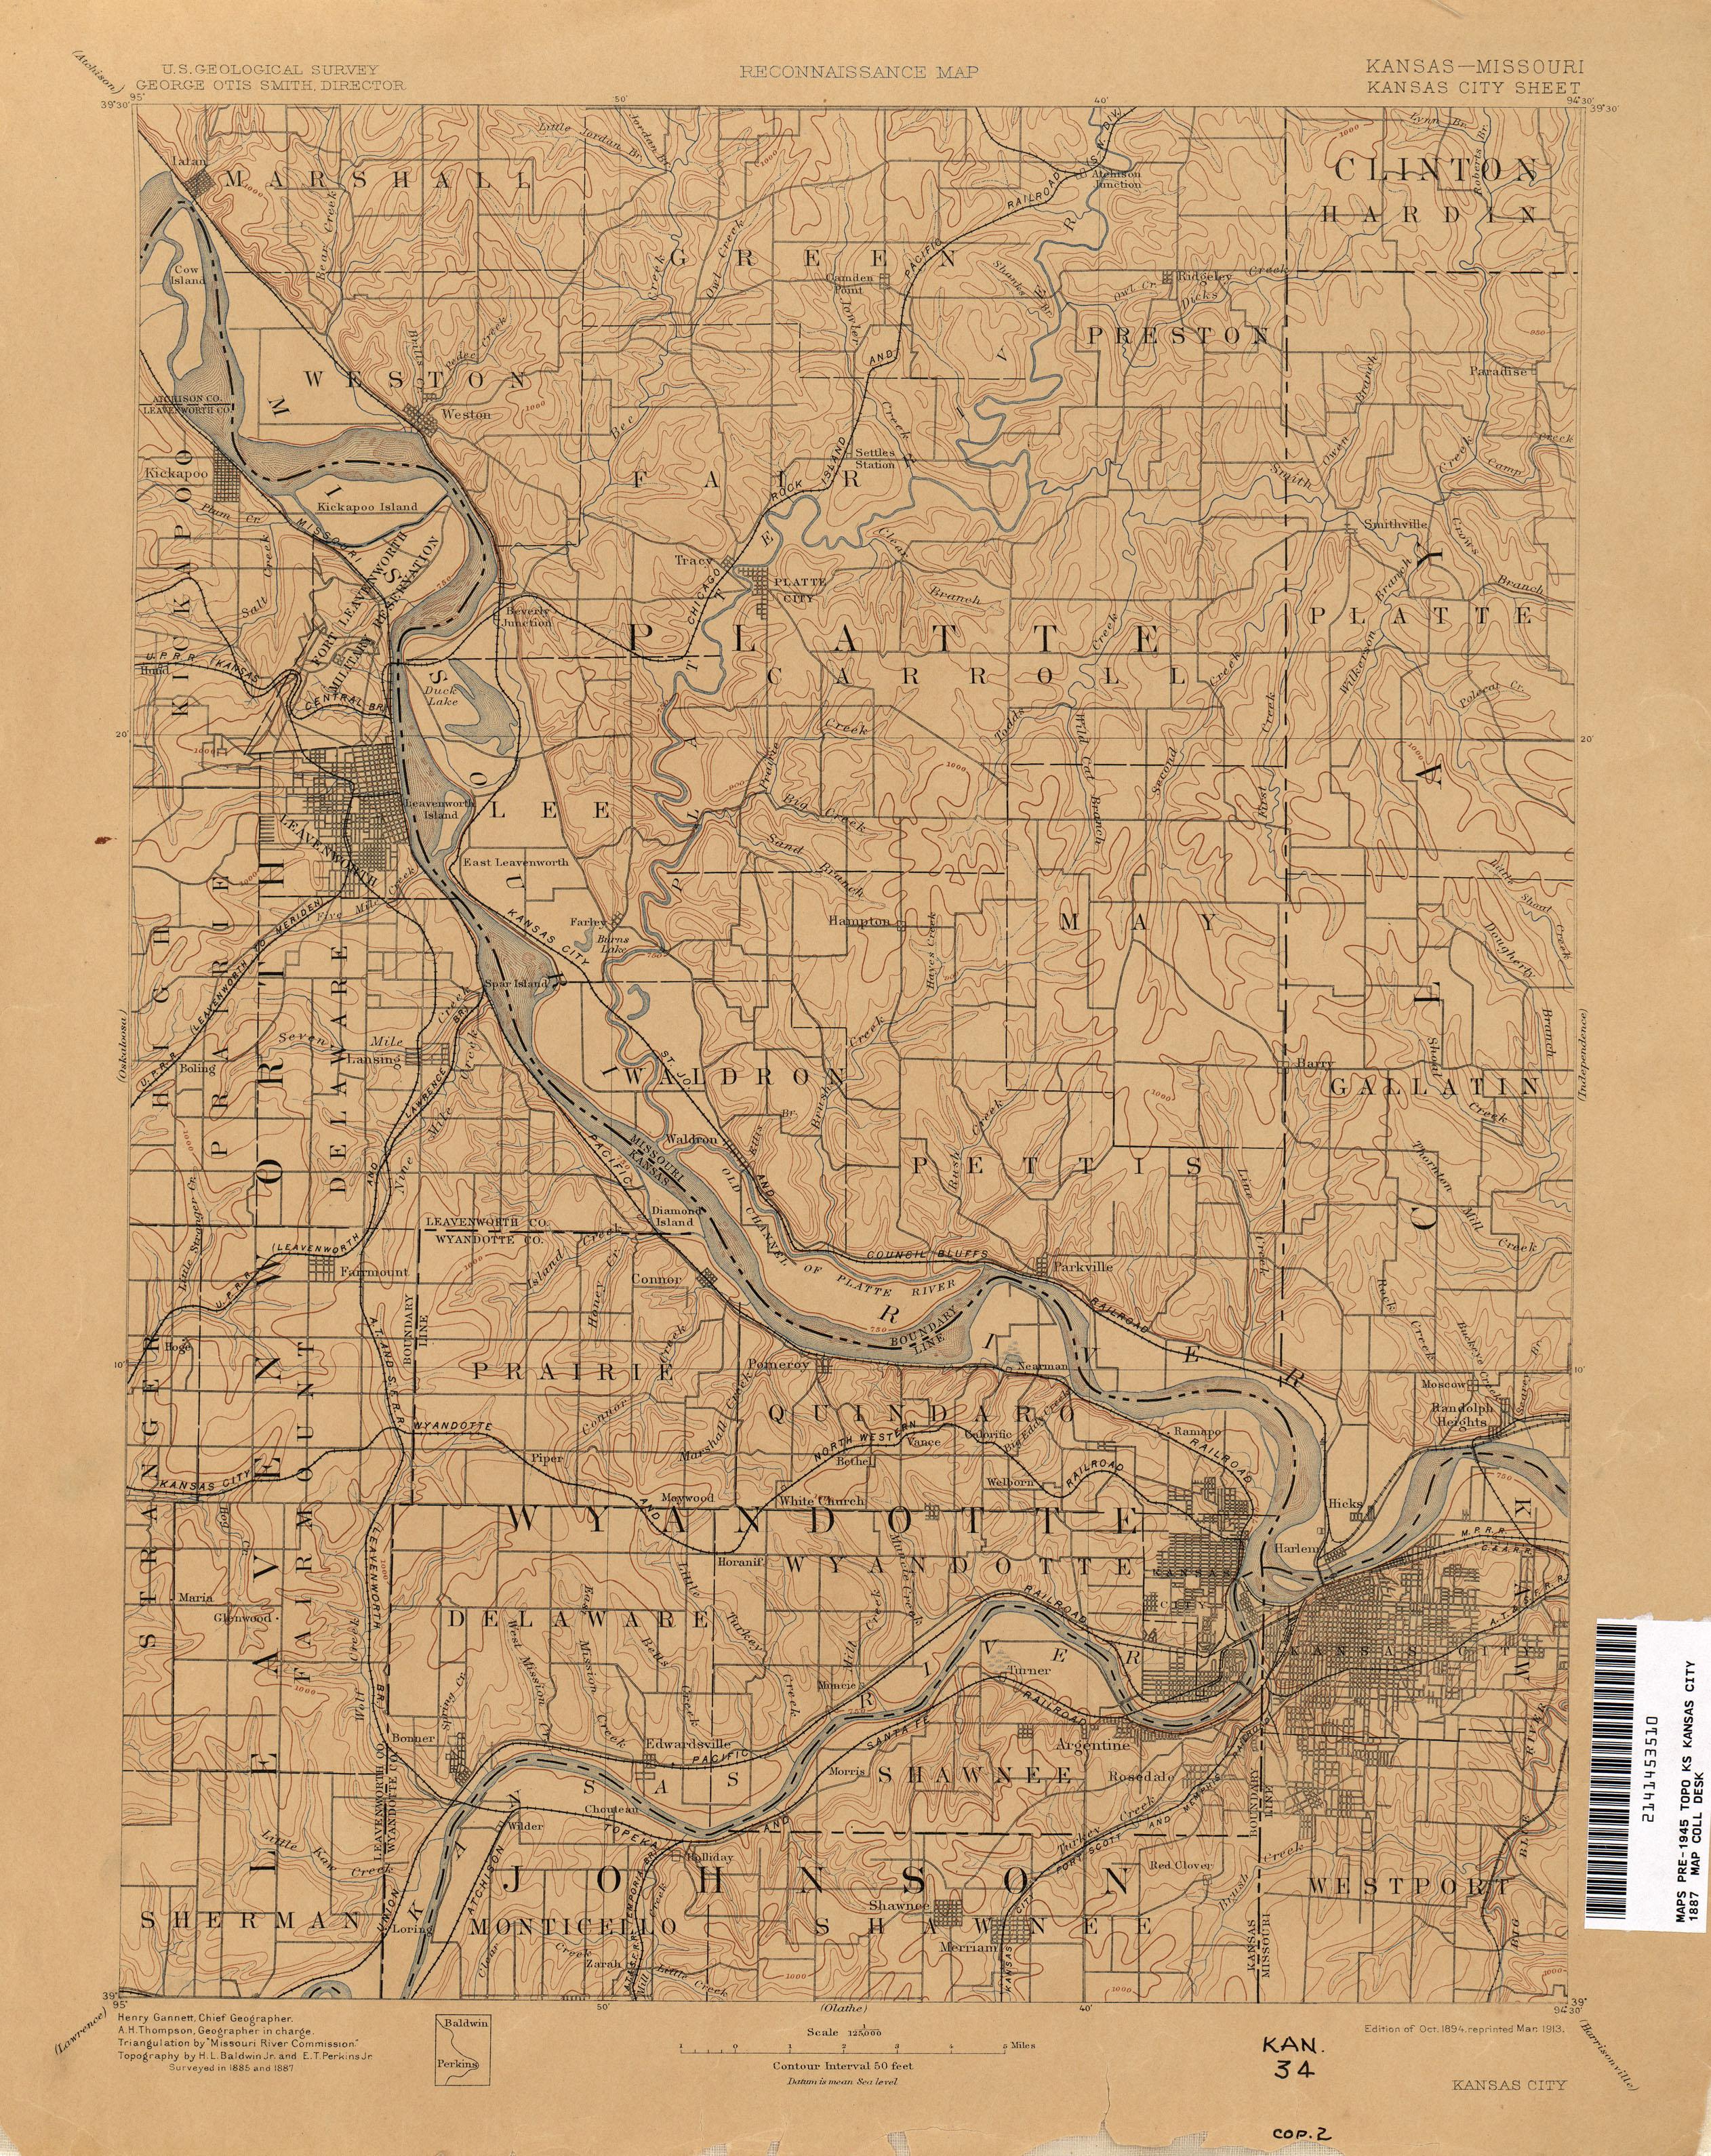 Kansas Historical Topographic Maps PerryCastañeda Map - Ks map